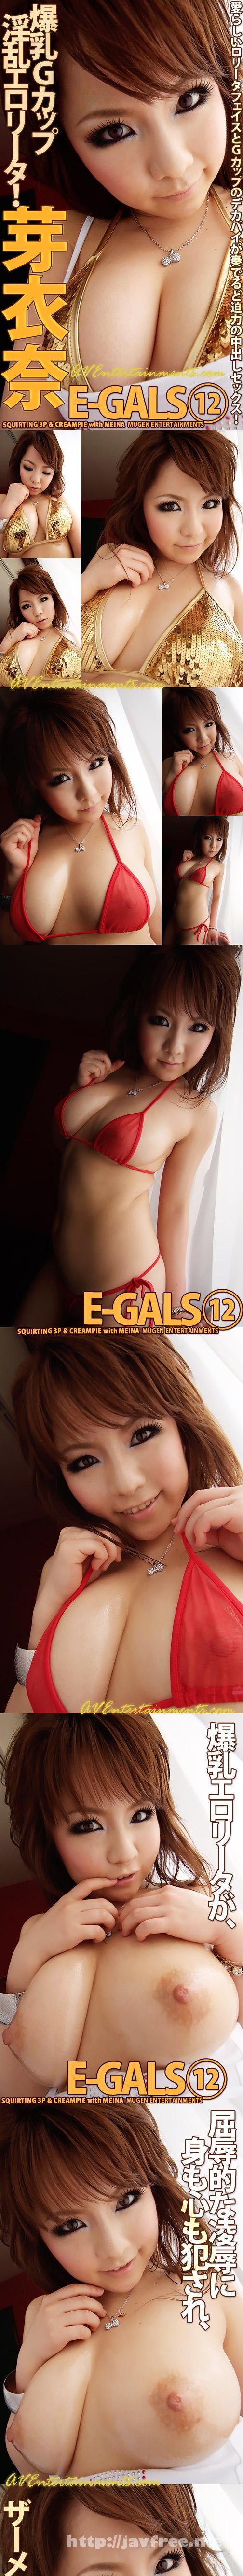 [MW 10] Egals Vol.12 : 芽衣奈 芽衣奈 mw Meina